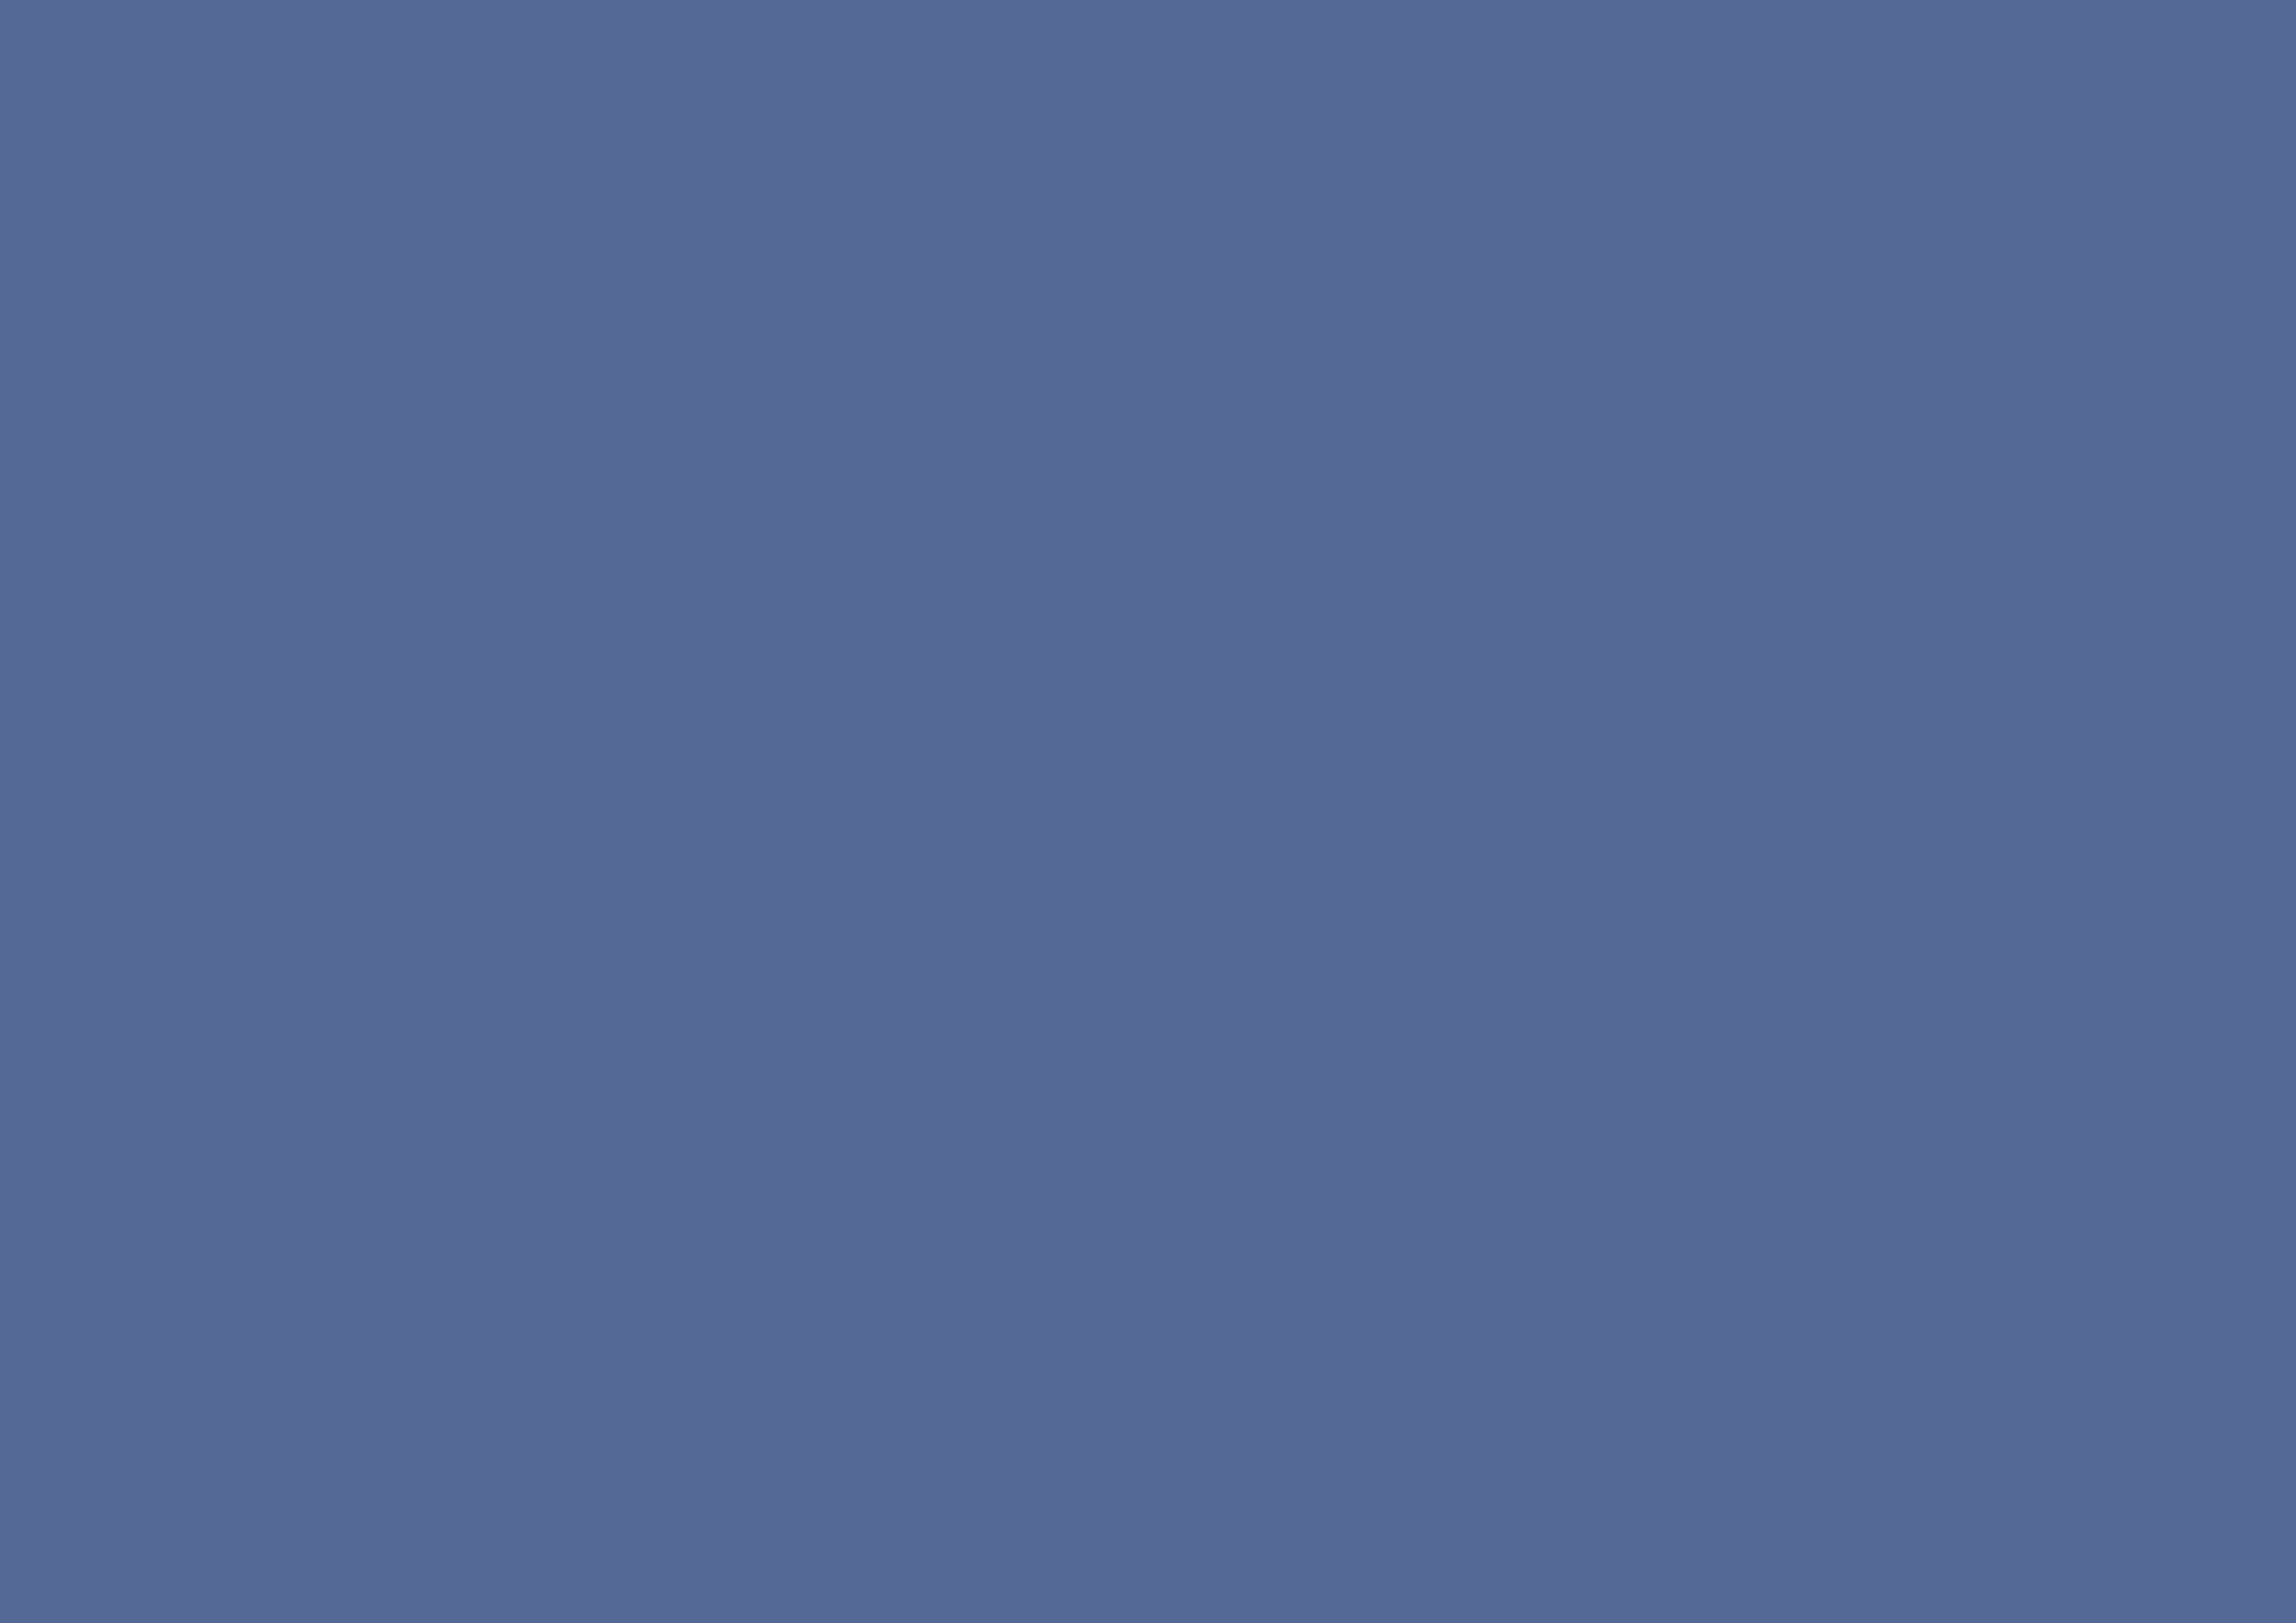 3508x2480 UCLA Blue Solid Color Background